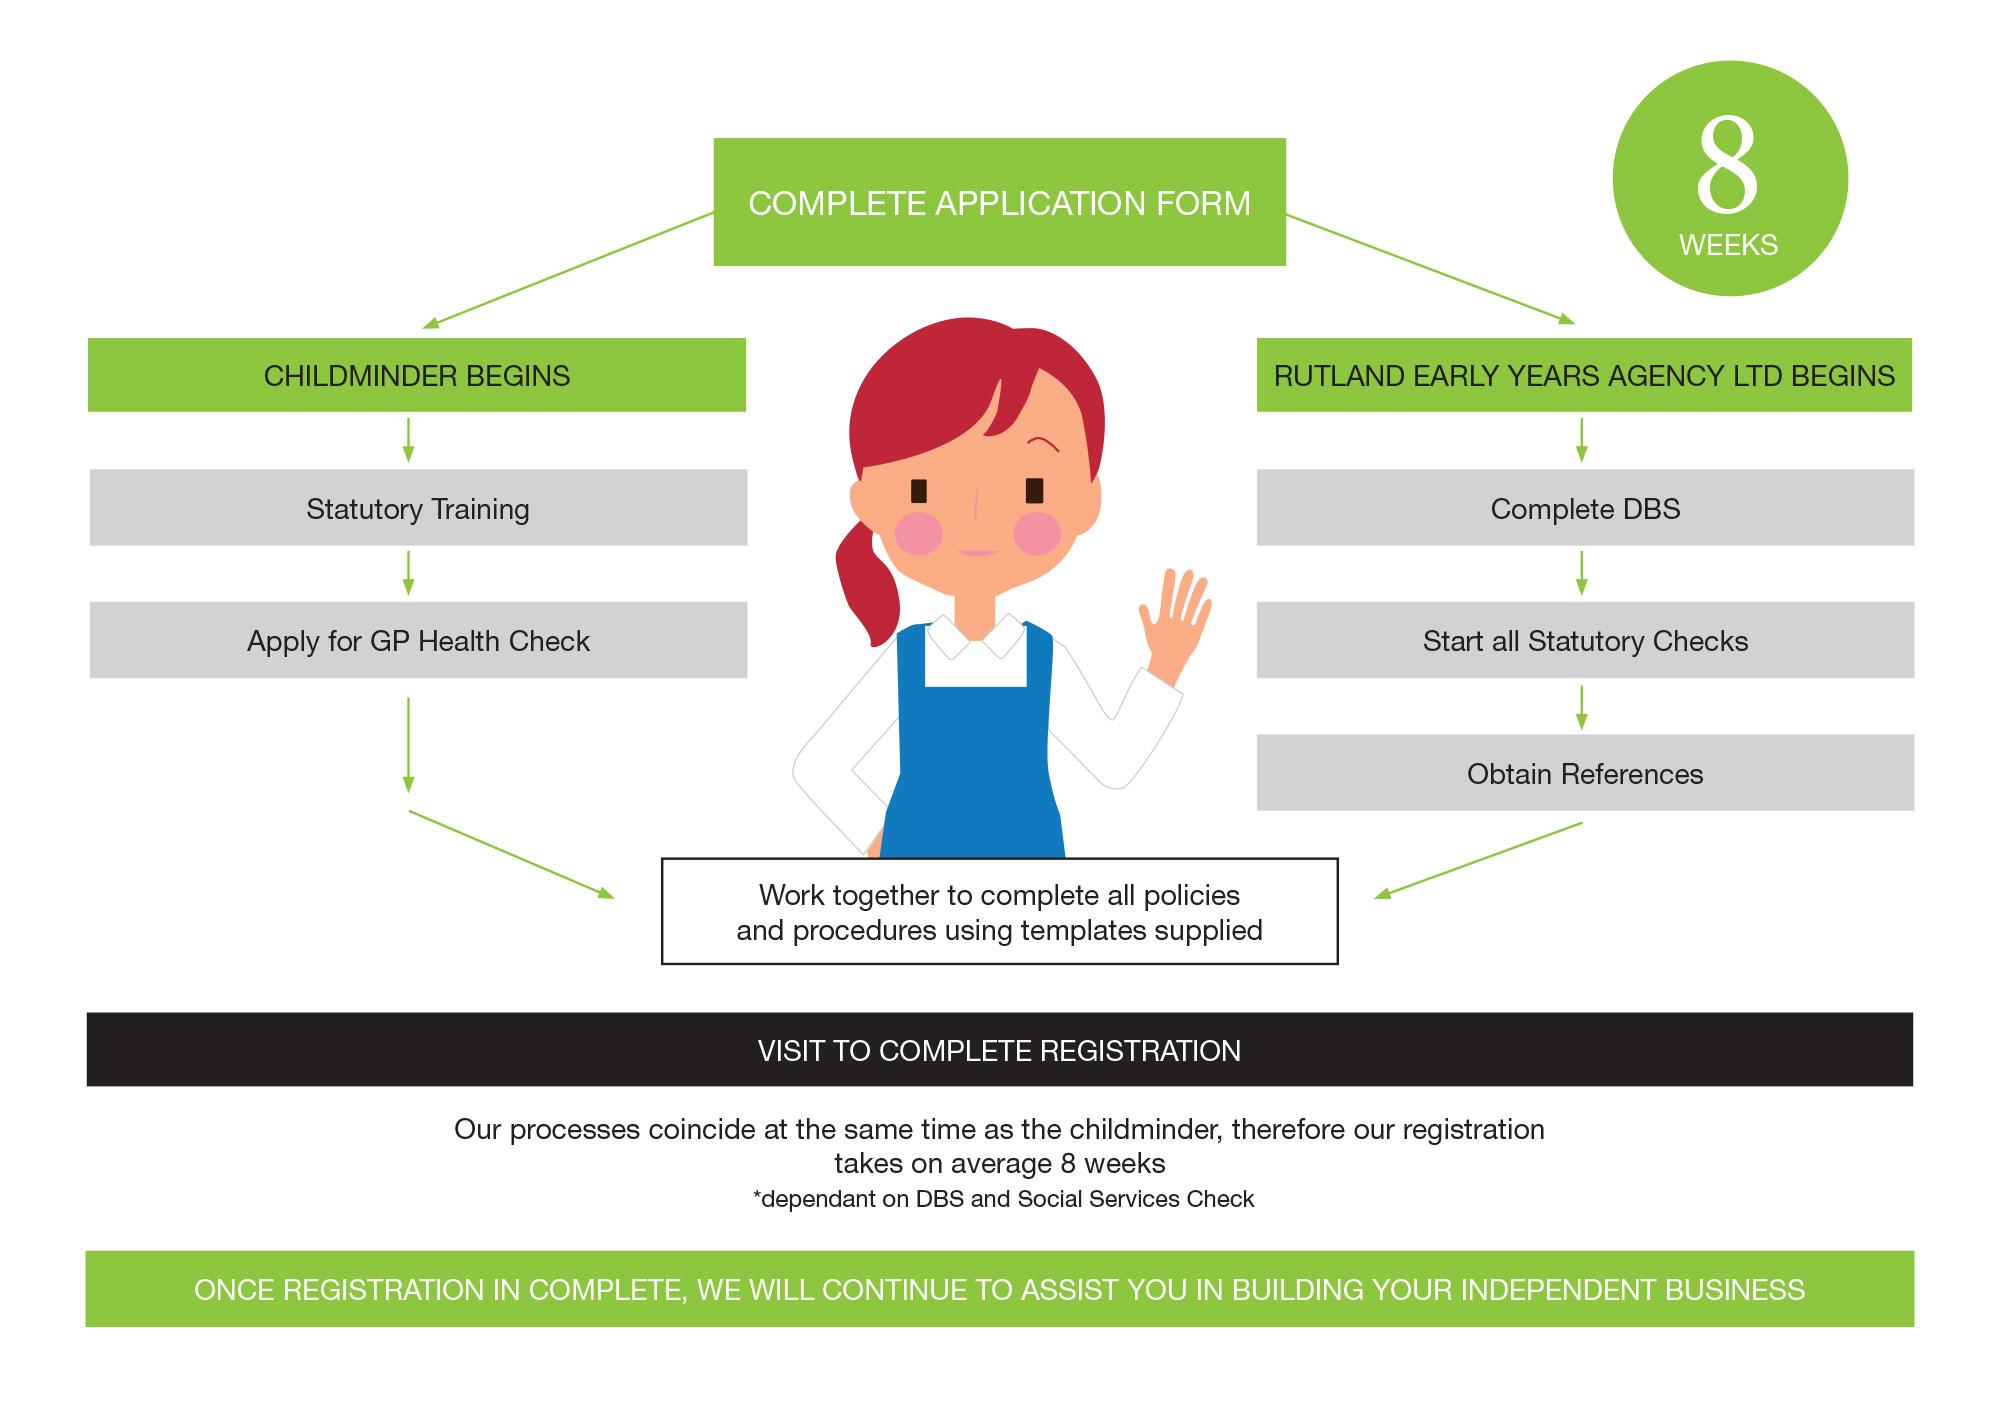 REYAL Process Map - New Childminder - 2019